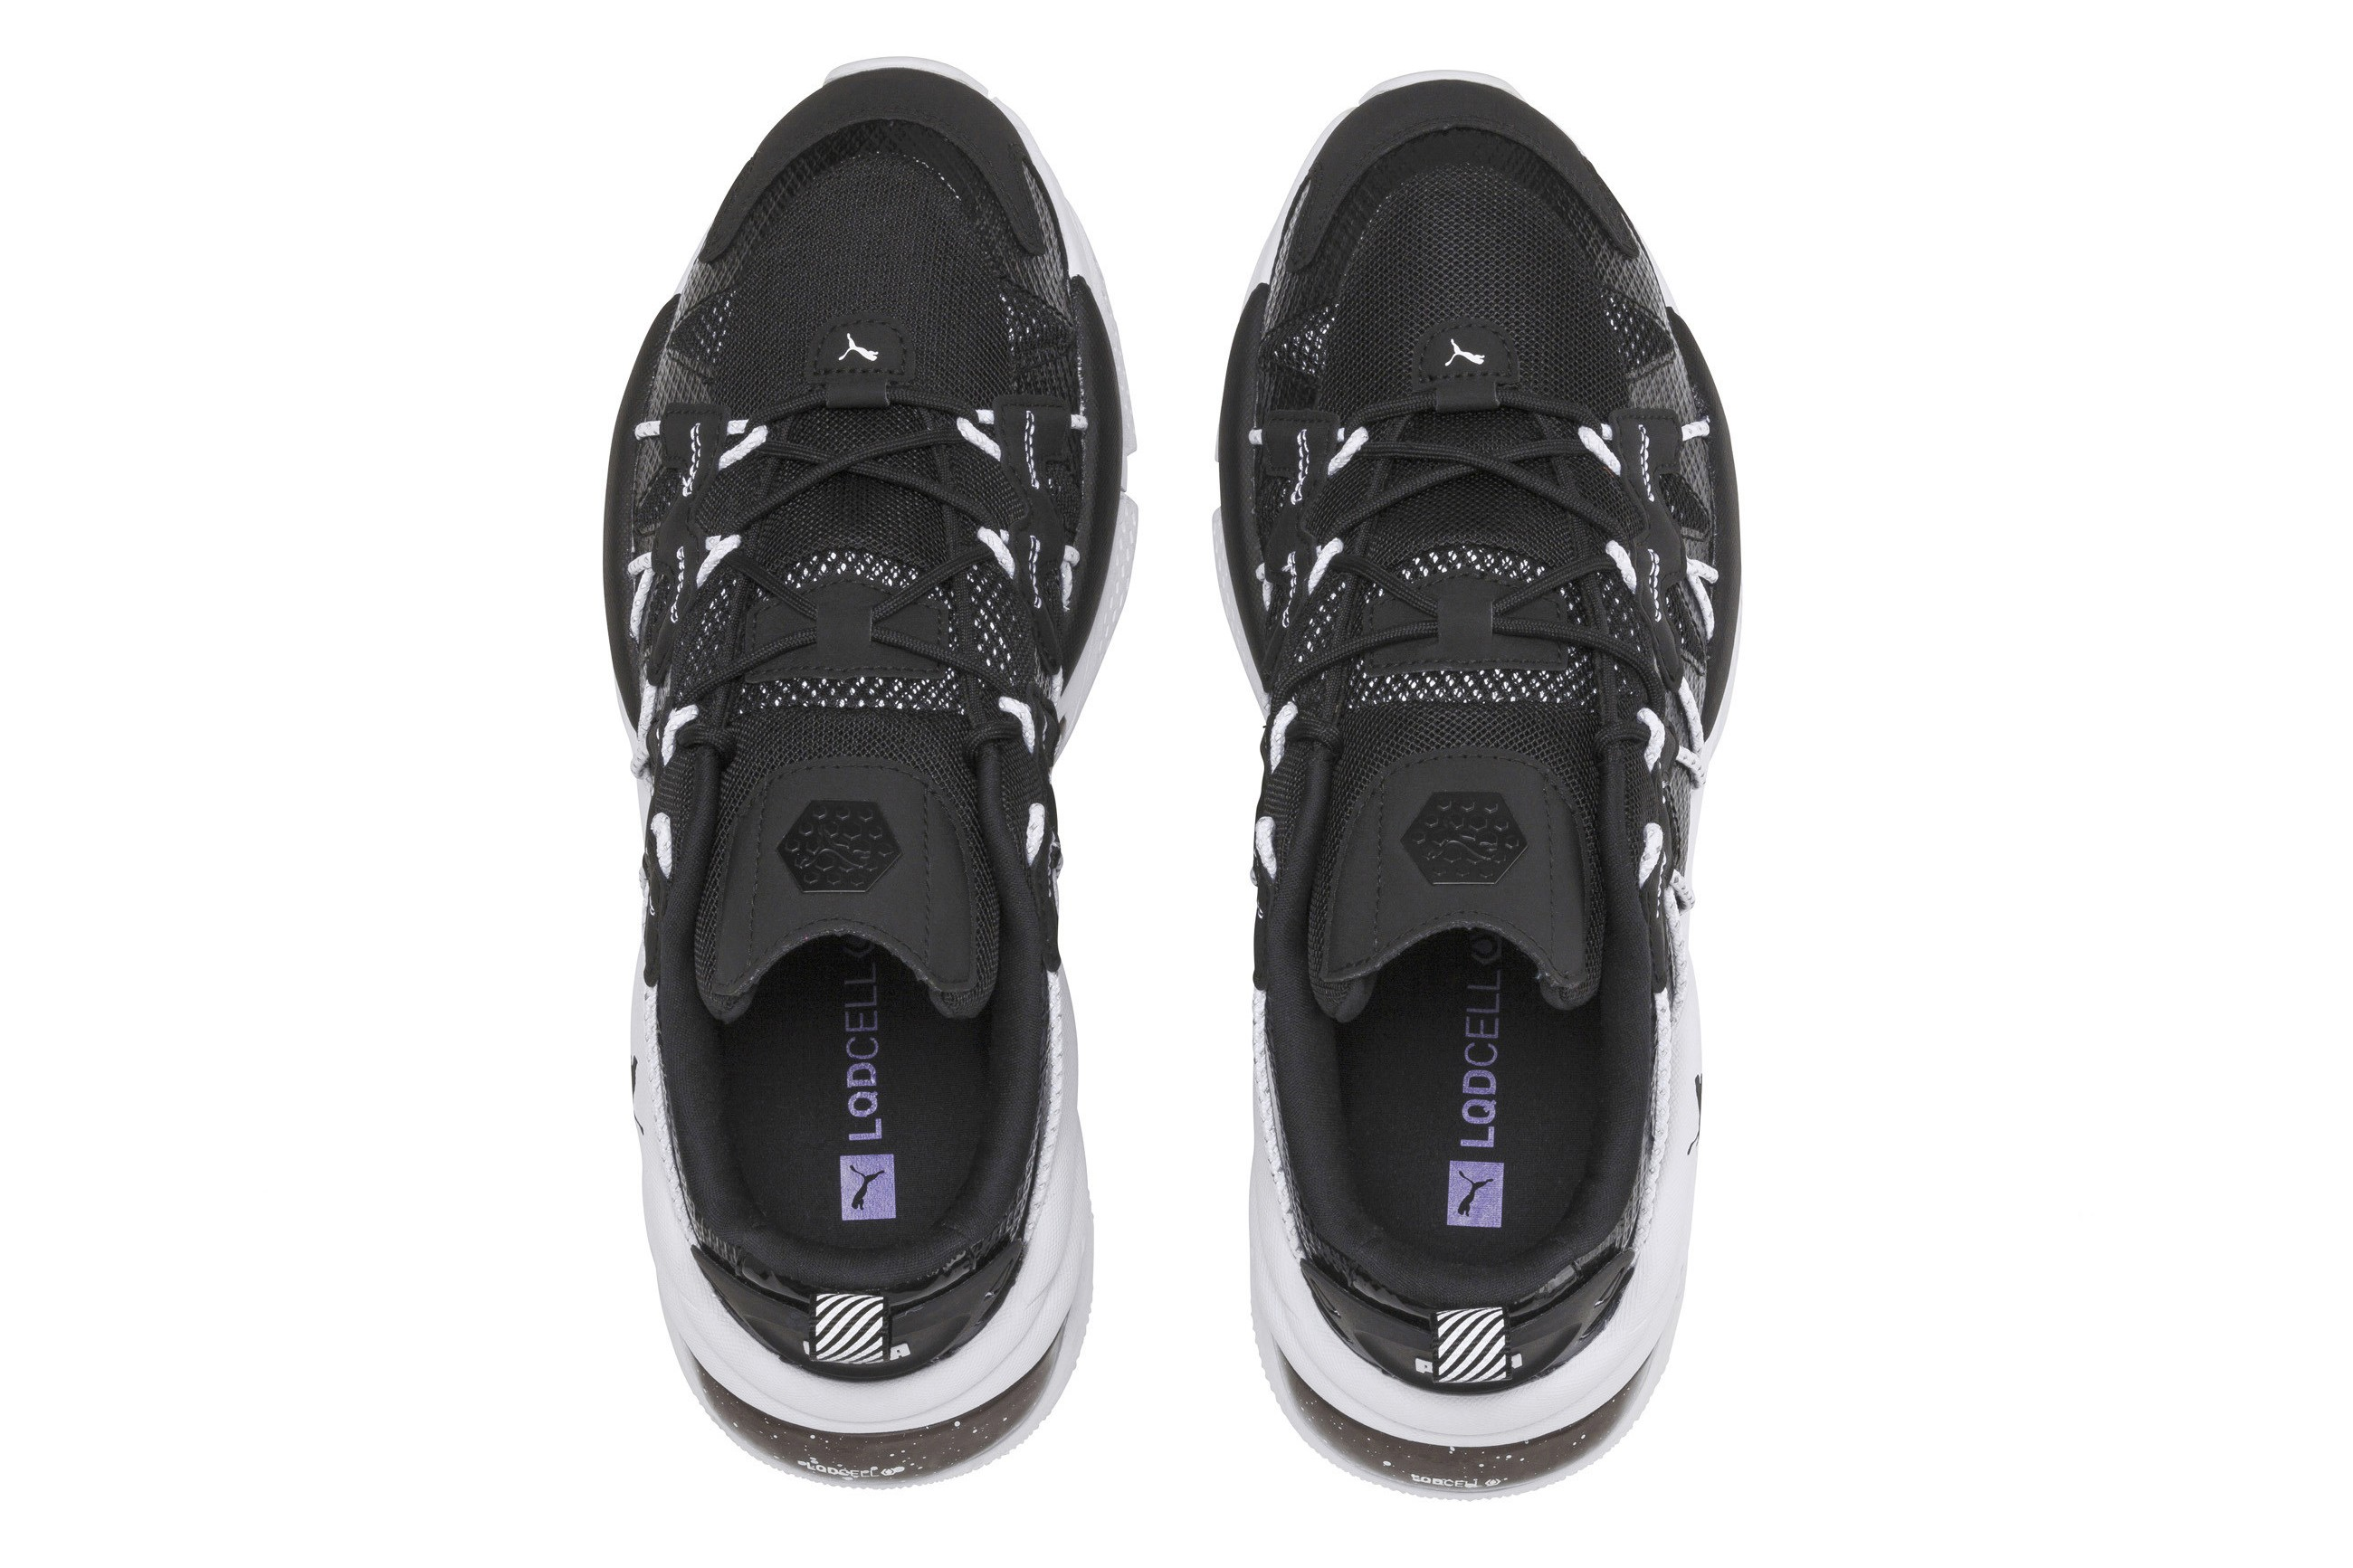 PUMA LQD Cell Omega Density Sneakers